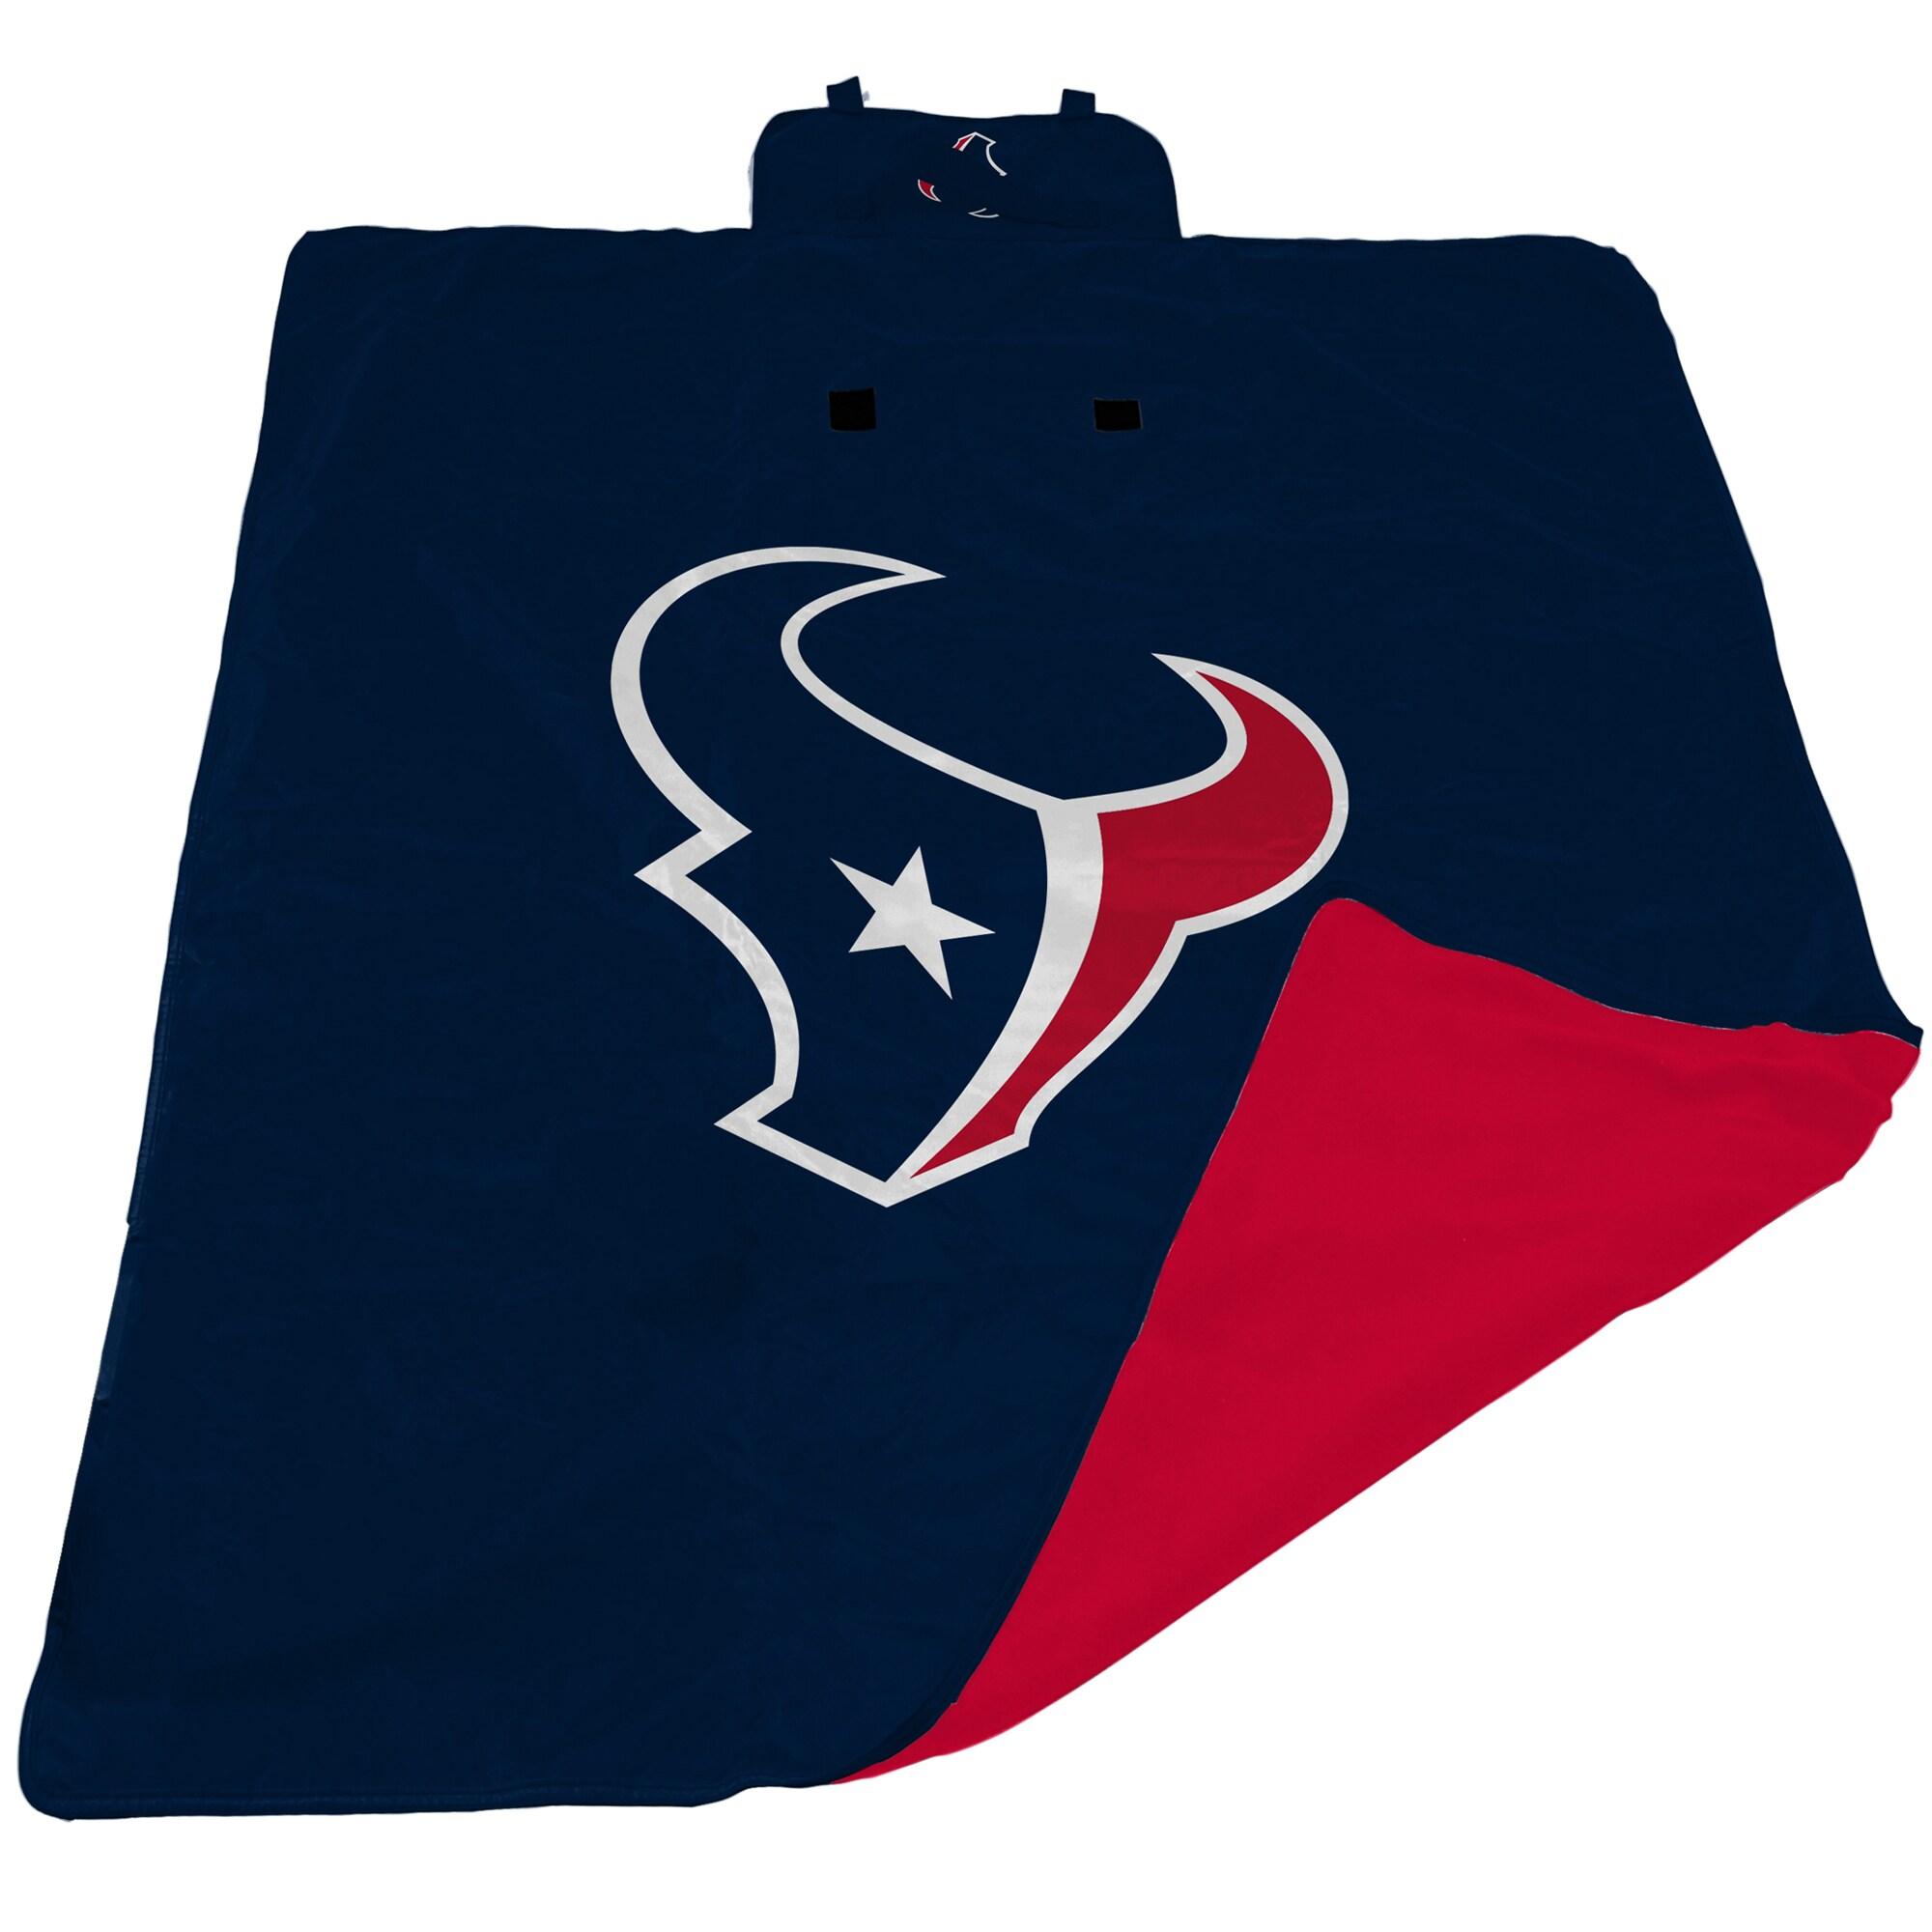 Houston Texans 60'' x 80'' All-Weather XL Outdoor Blanket - Navy